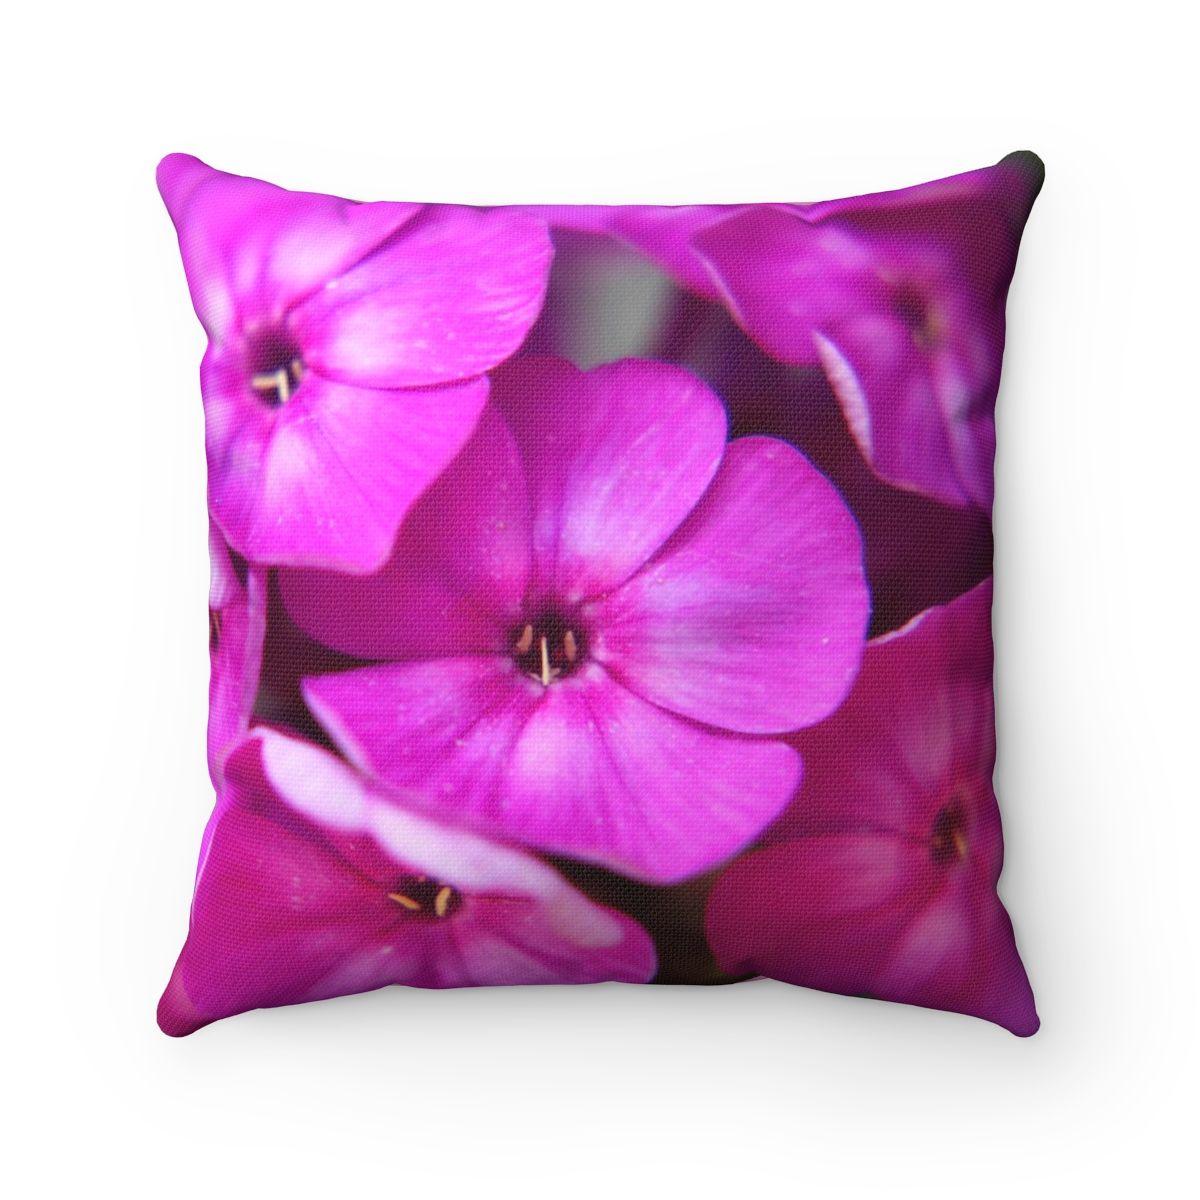 Spun Polyester Bright Pink Flowers Pillow Home Decor Flower Print Throw Pillow Floral Flower Pillow Pillows Floral Printed Throw Pillows